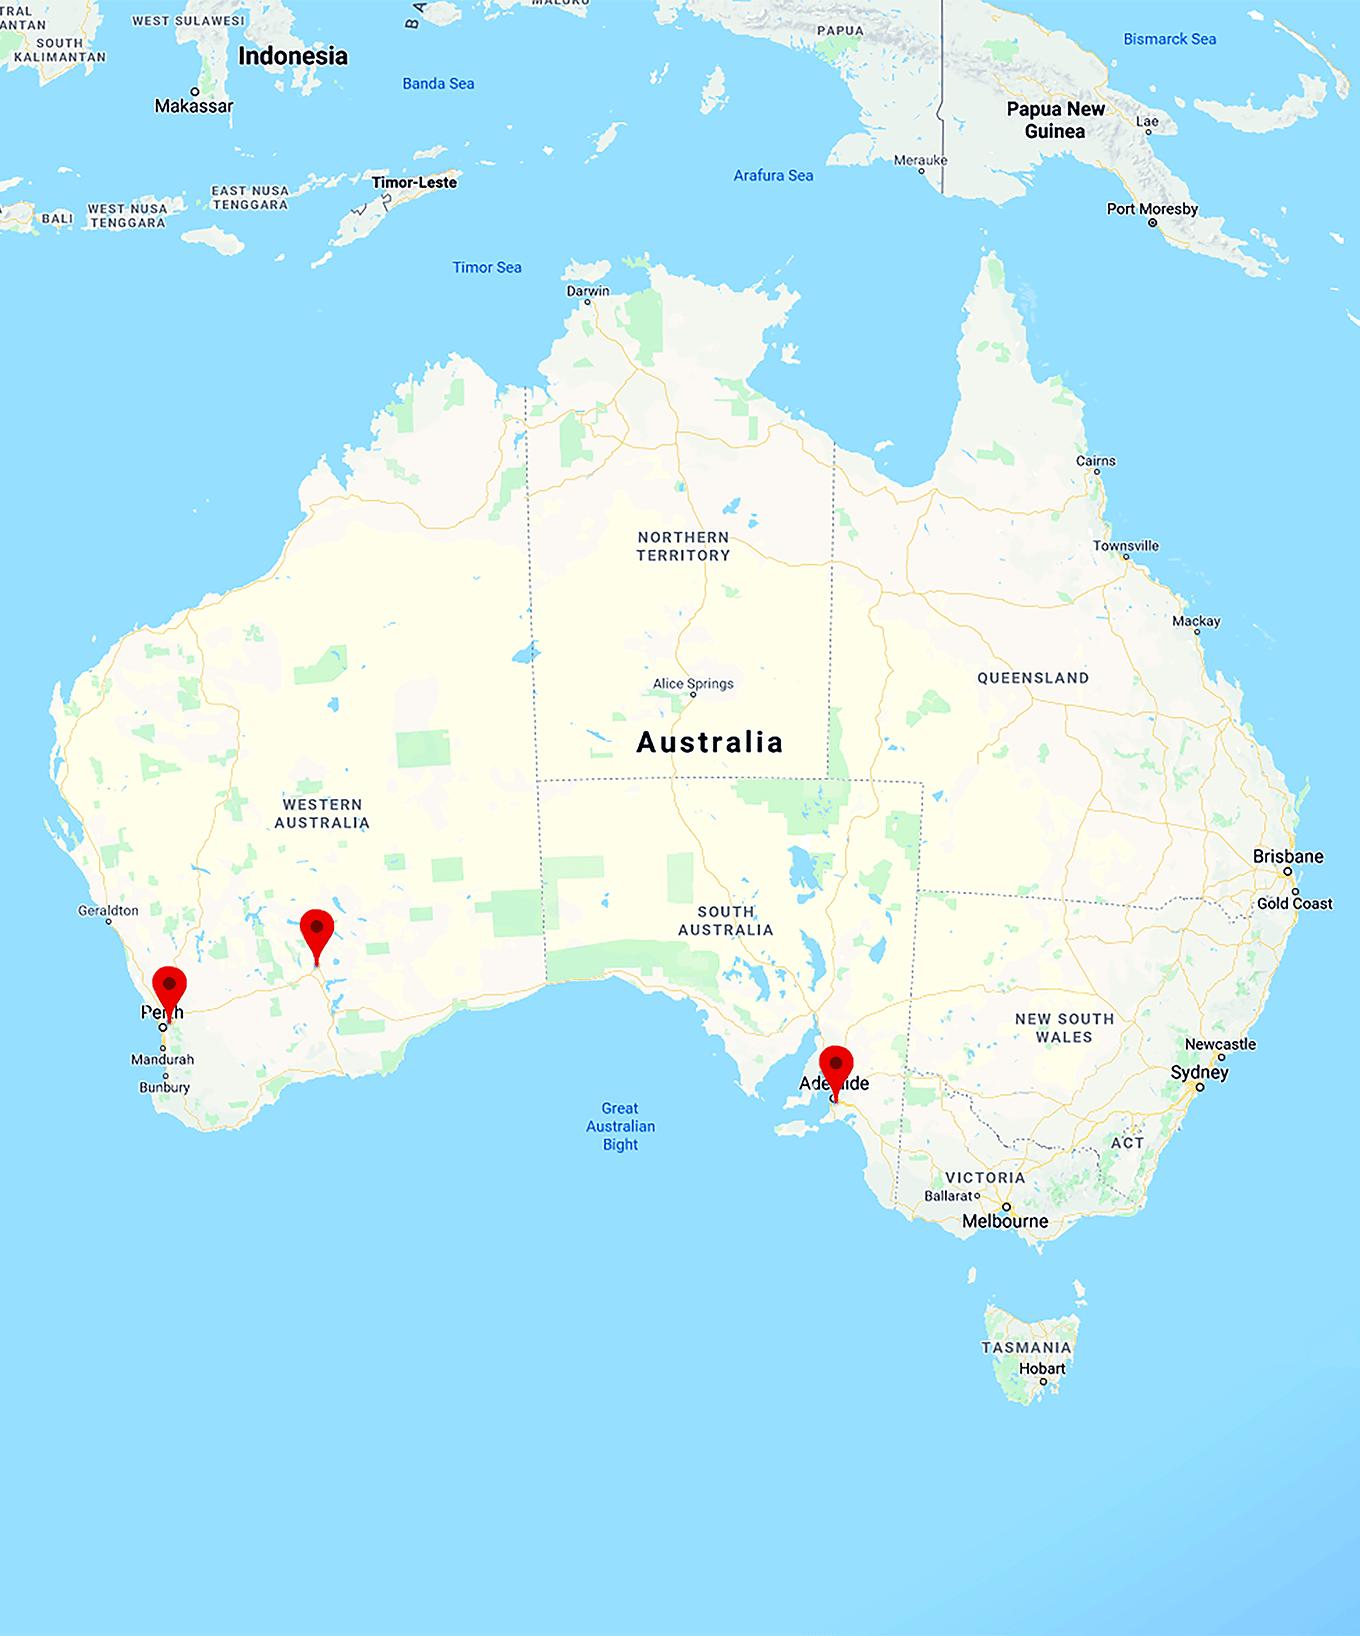 Australia Map Kalgoorlie.Kalgoorlie Statewide Oil